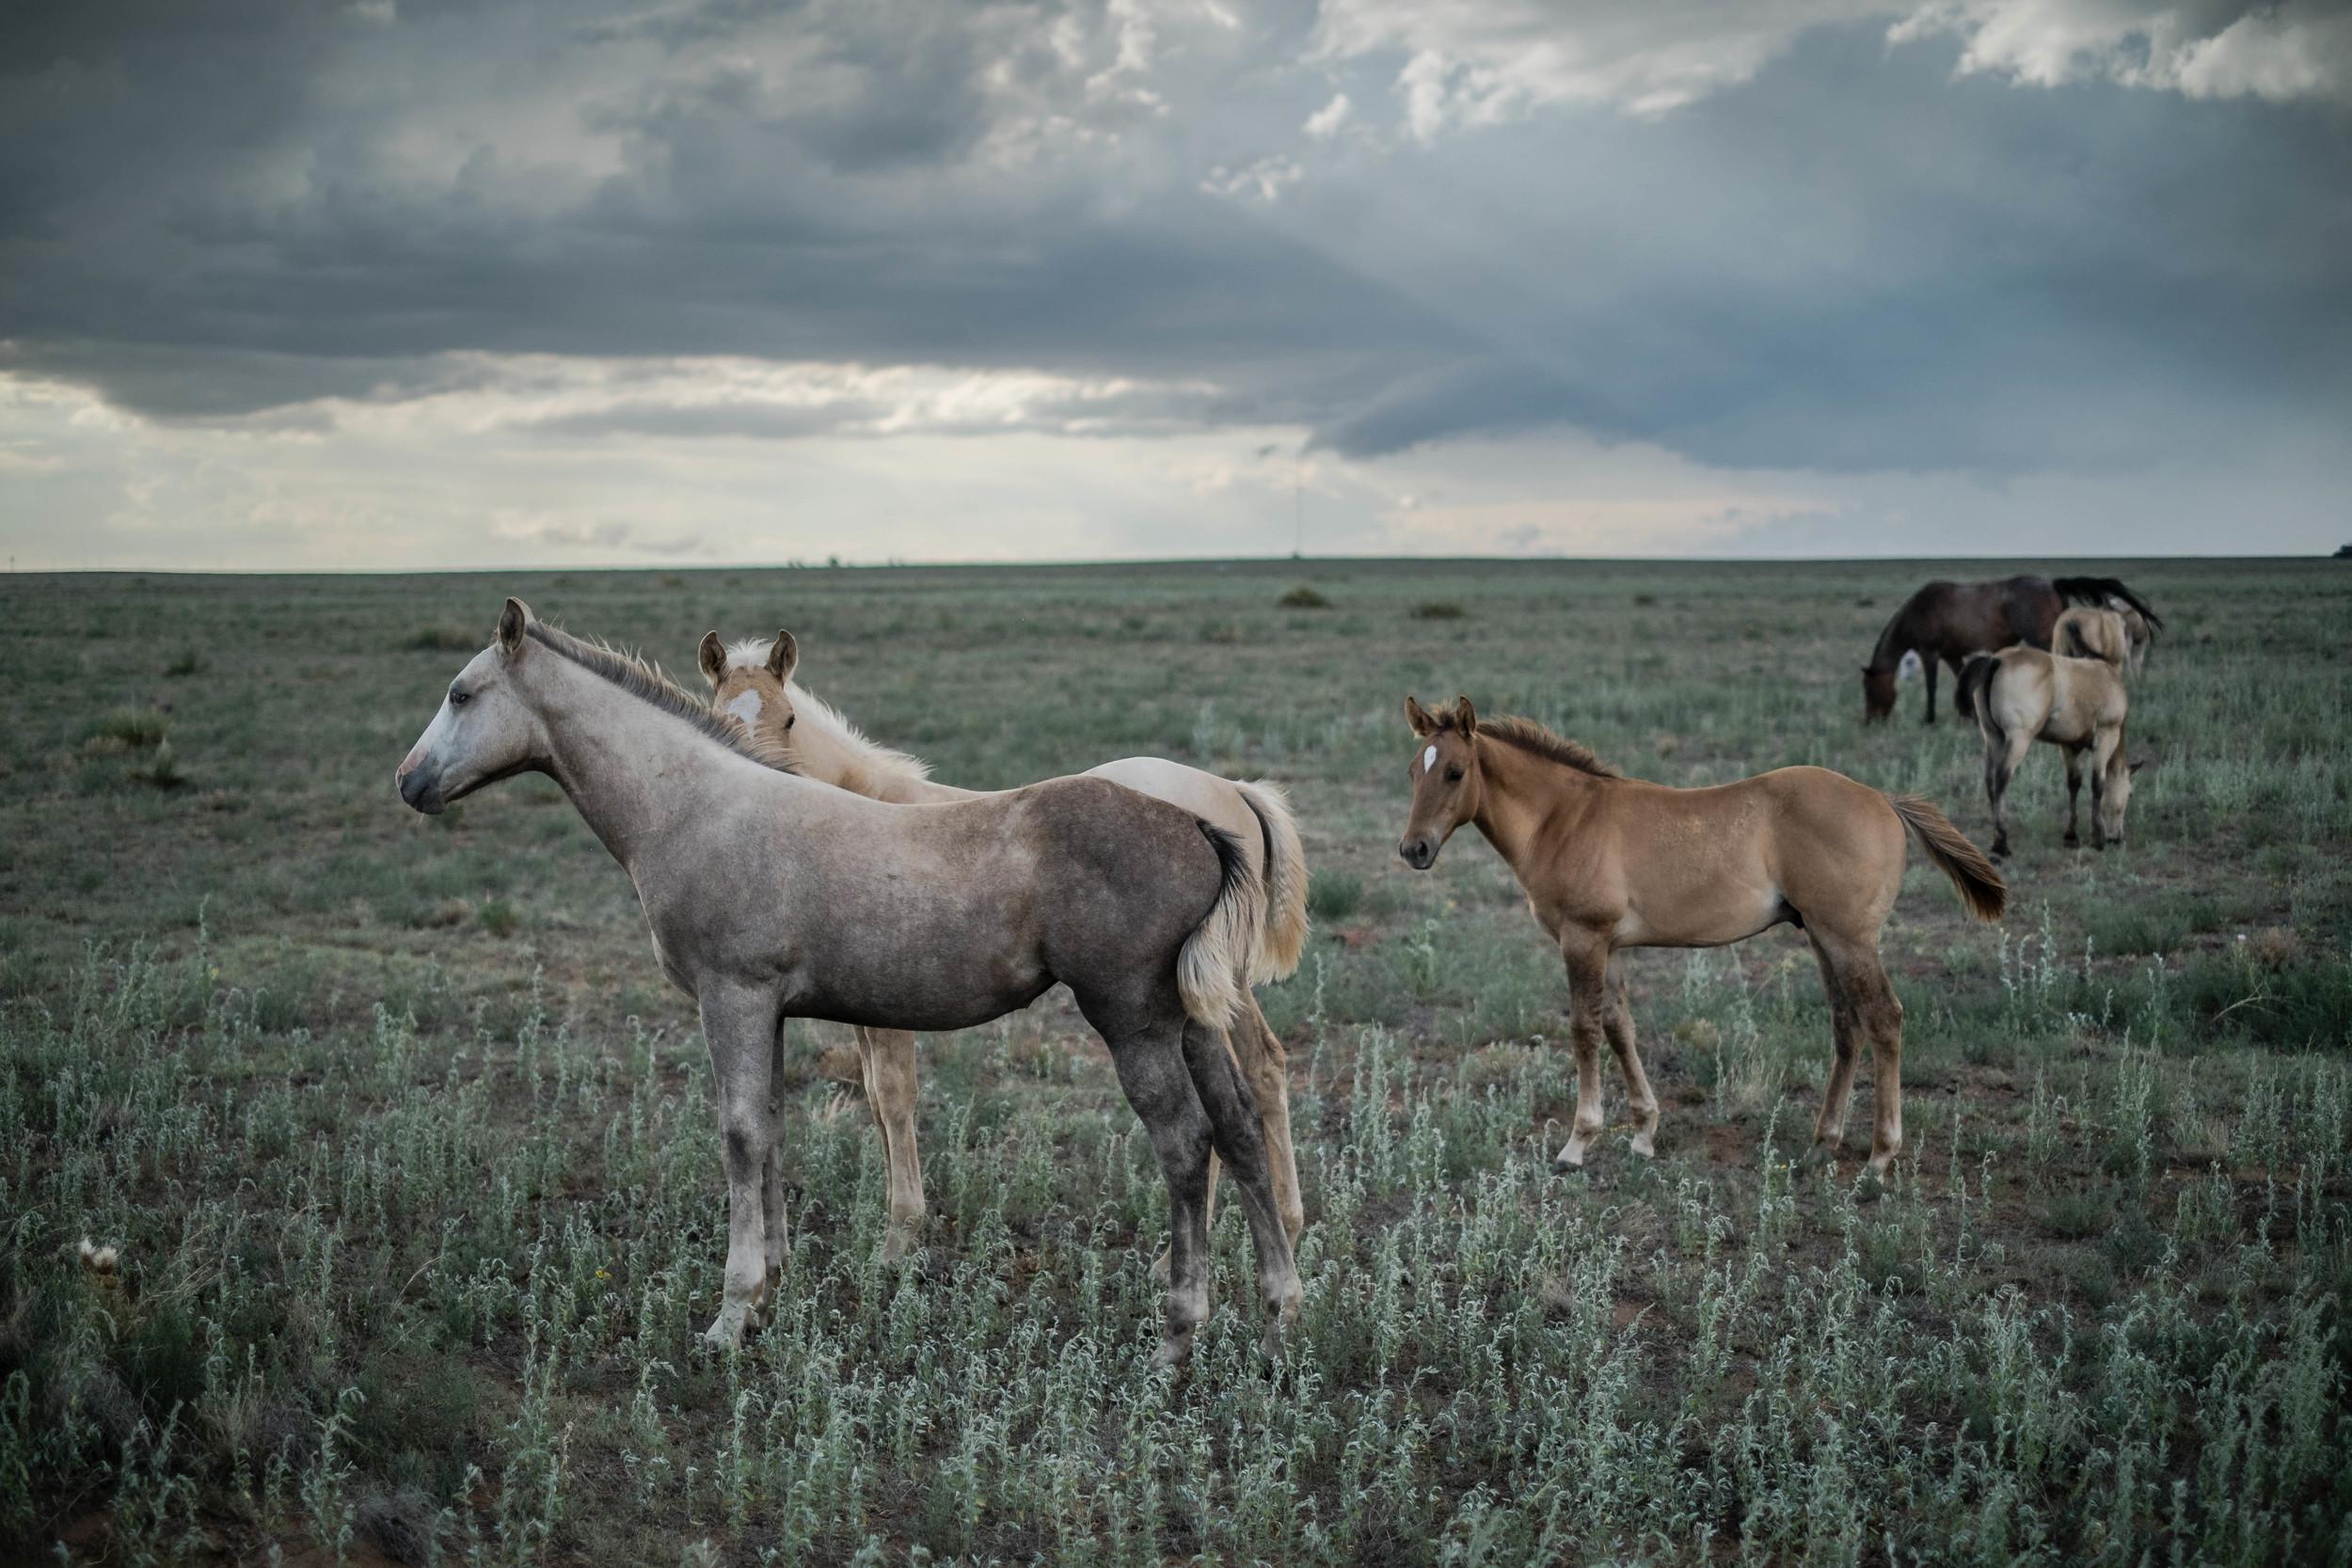 Union County, New Mexico